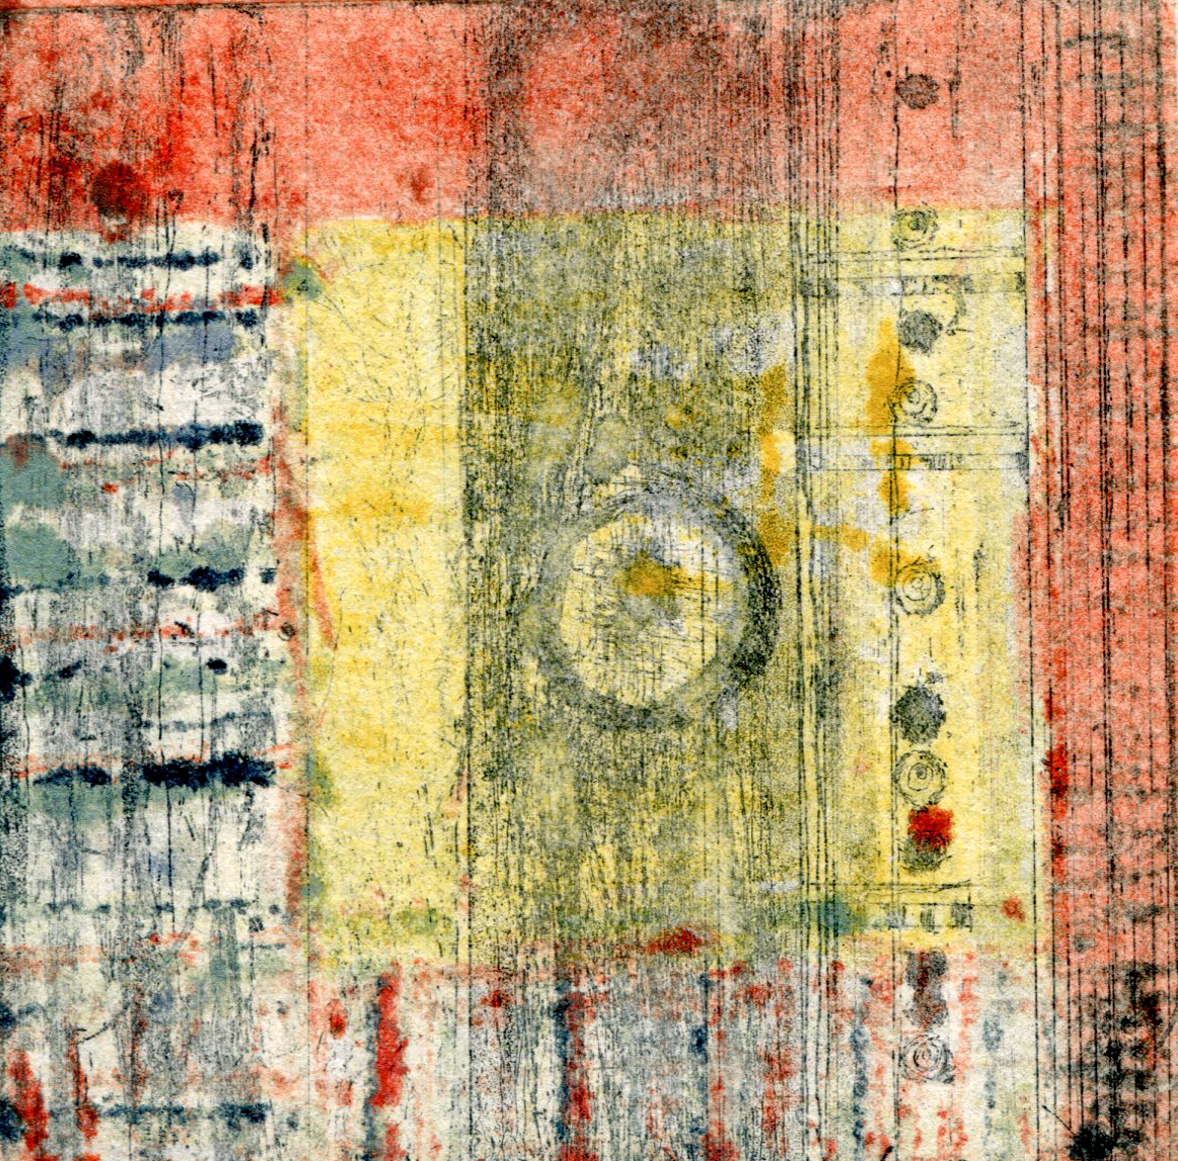 Vintage Fabric Square 1